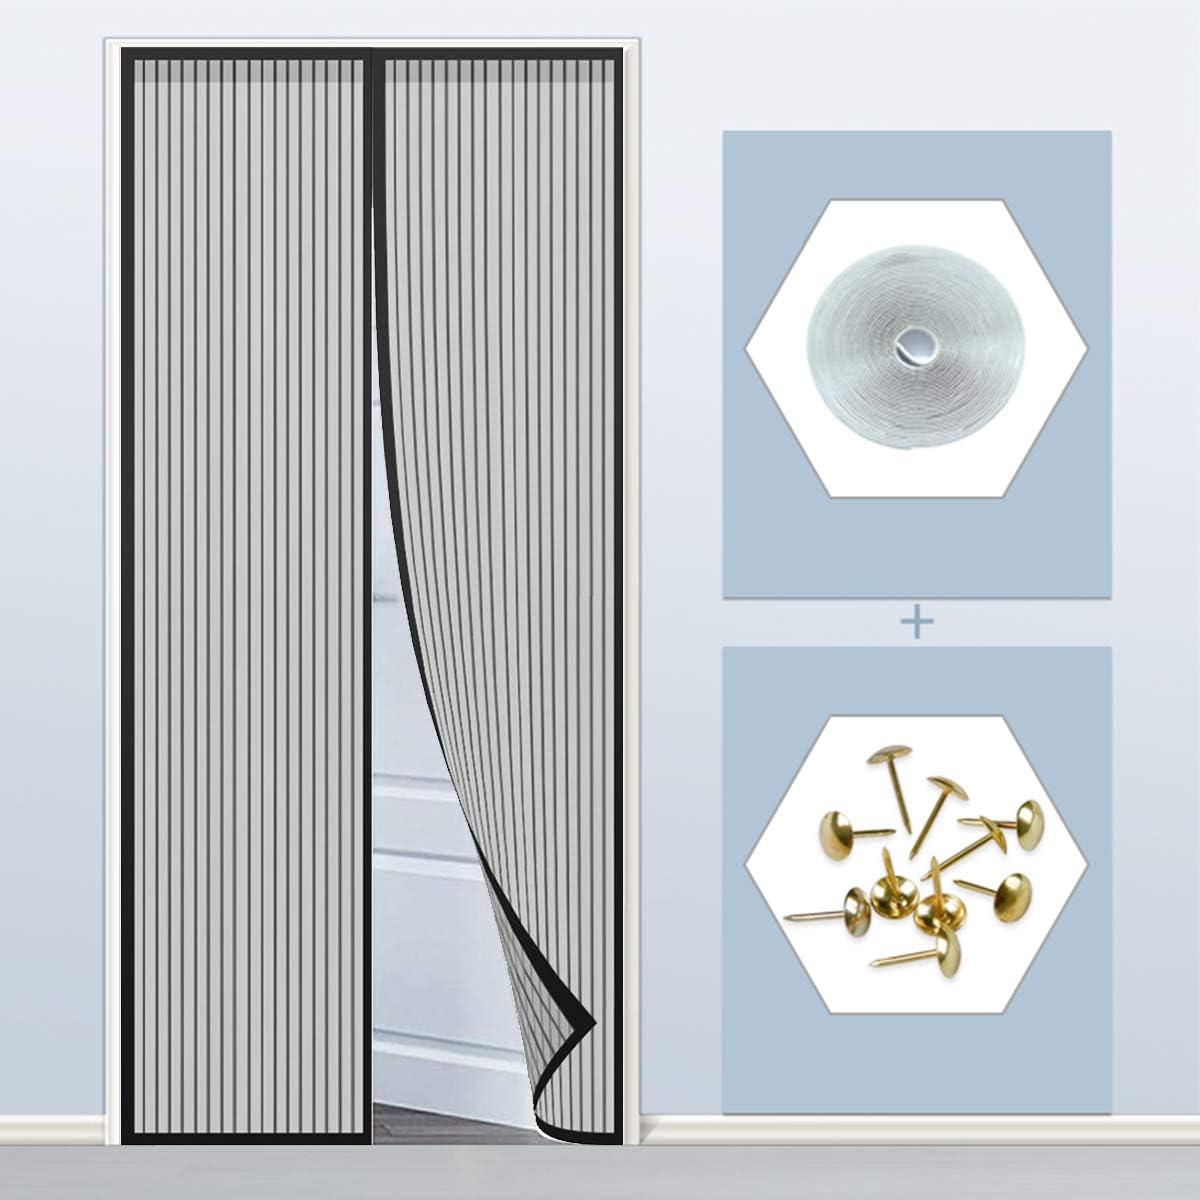 Cortina Mosquitera Magnética 140x210cm(55x83inch) Tejido Súper Fino Magnética Automático Permite Entrada Aire Fresco para Balcón Puerta Corredera de Patio, Negro